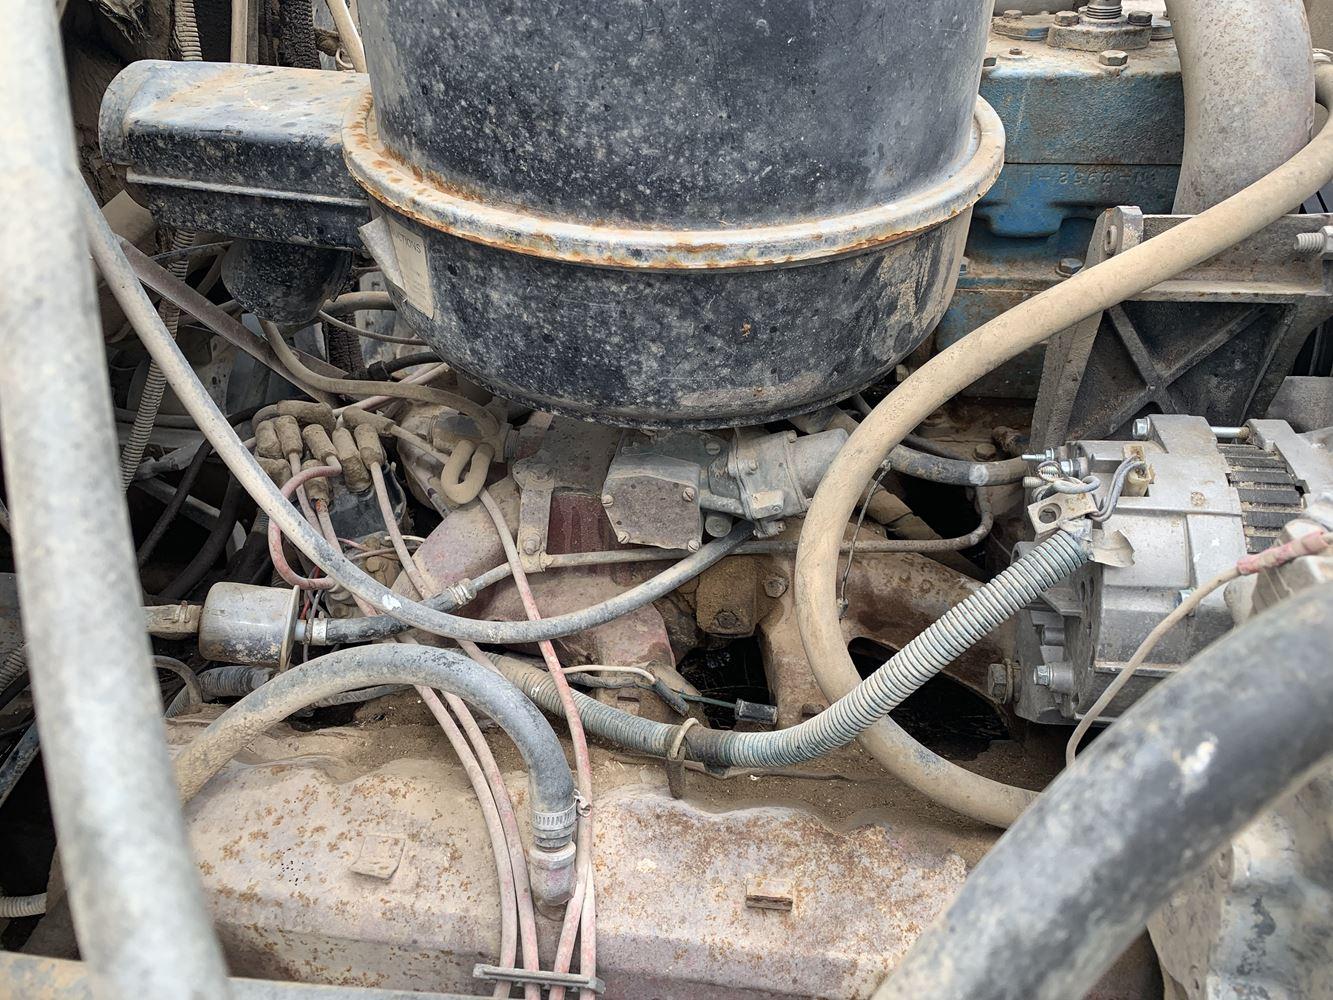 Engines & Engine Parts | Holst Truck Parts